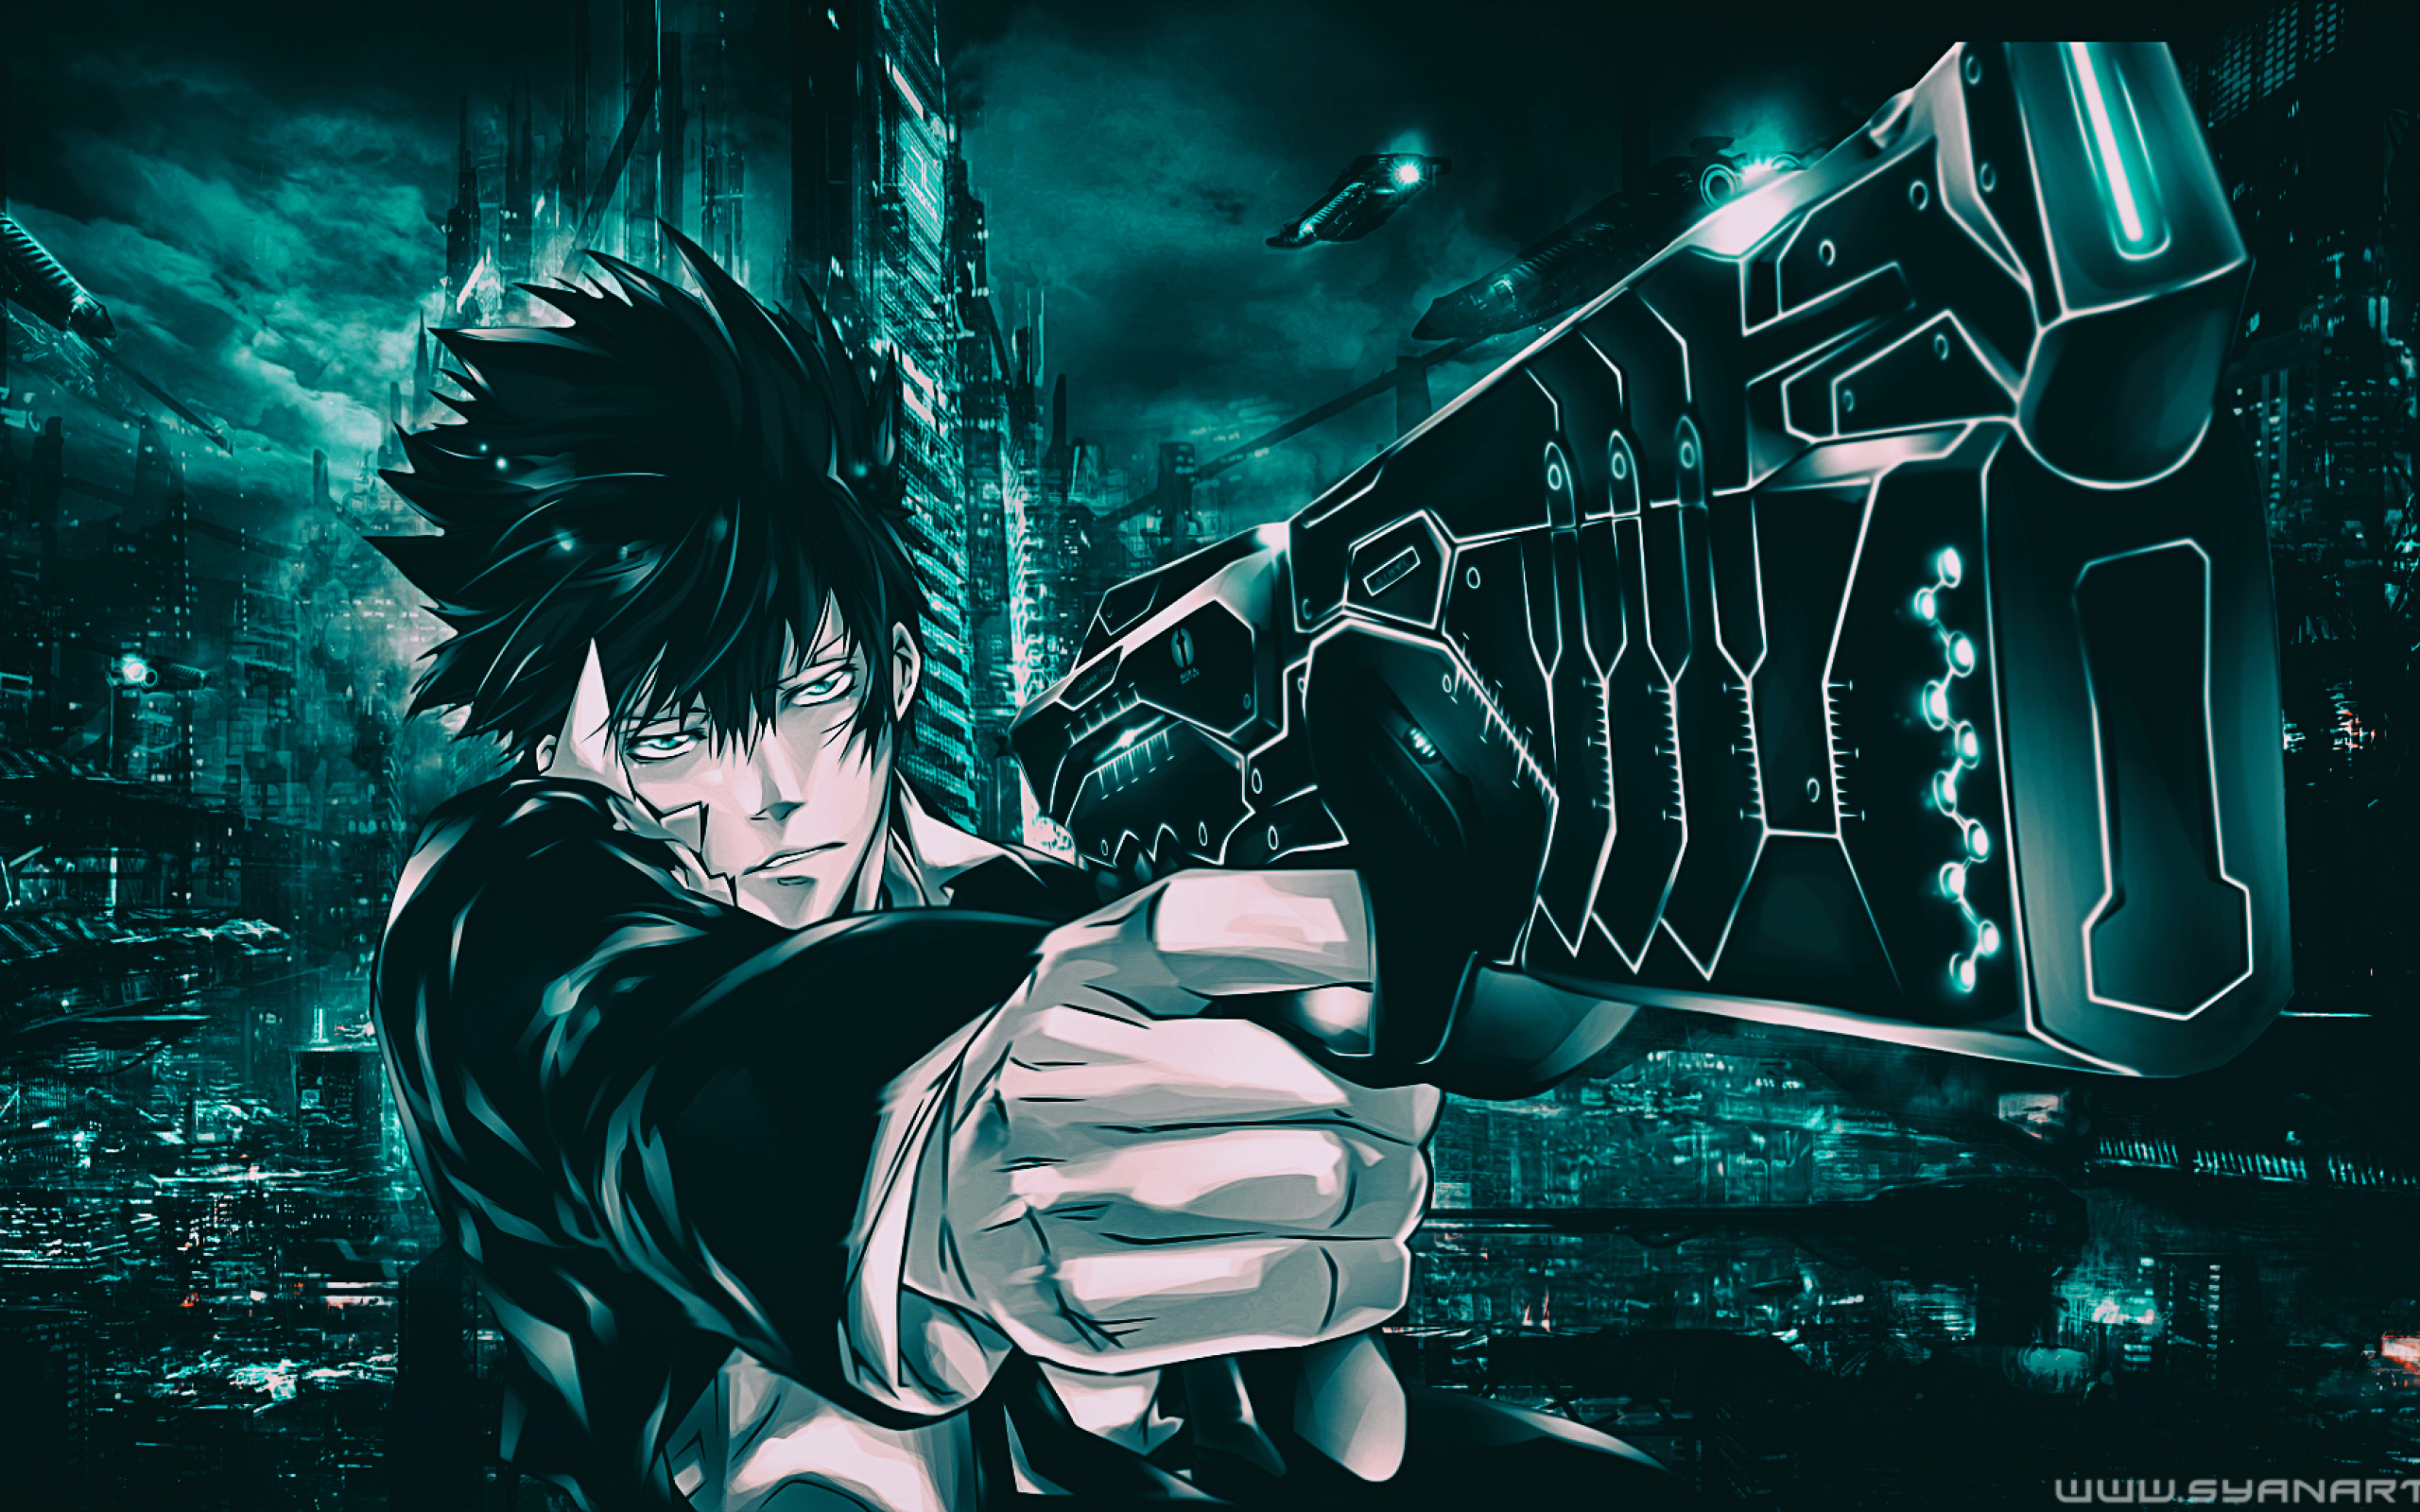 2560x1600 Shinya Kogami From Psycho Pass 2560x1600 Resolution